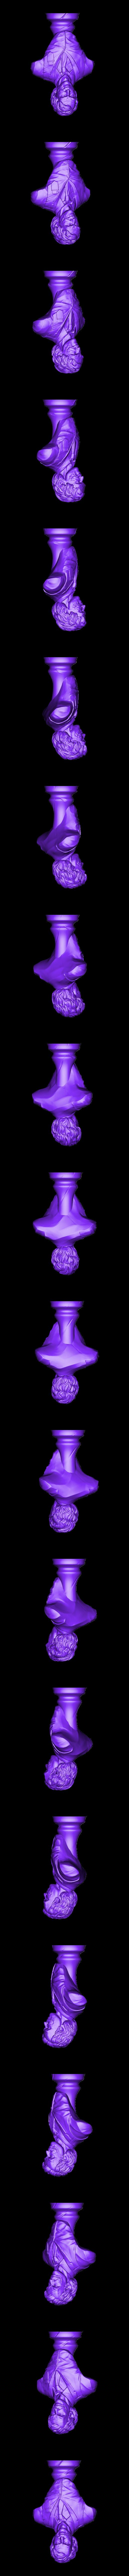 Download Free Stl File Joker Bust 3d Print Design Cults